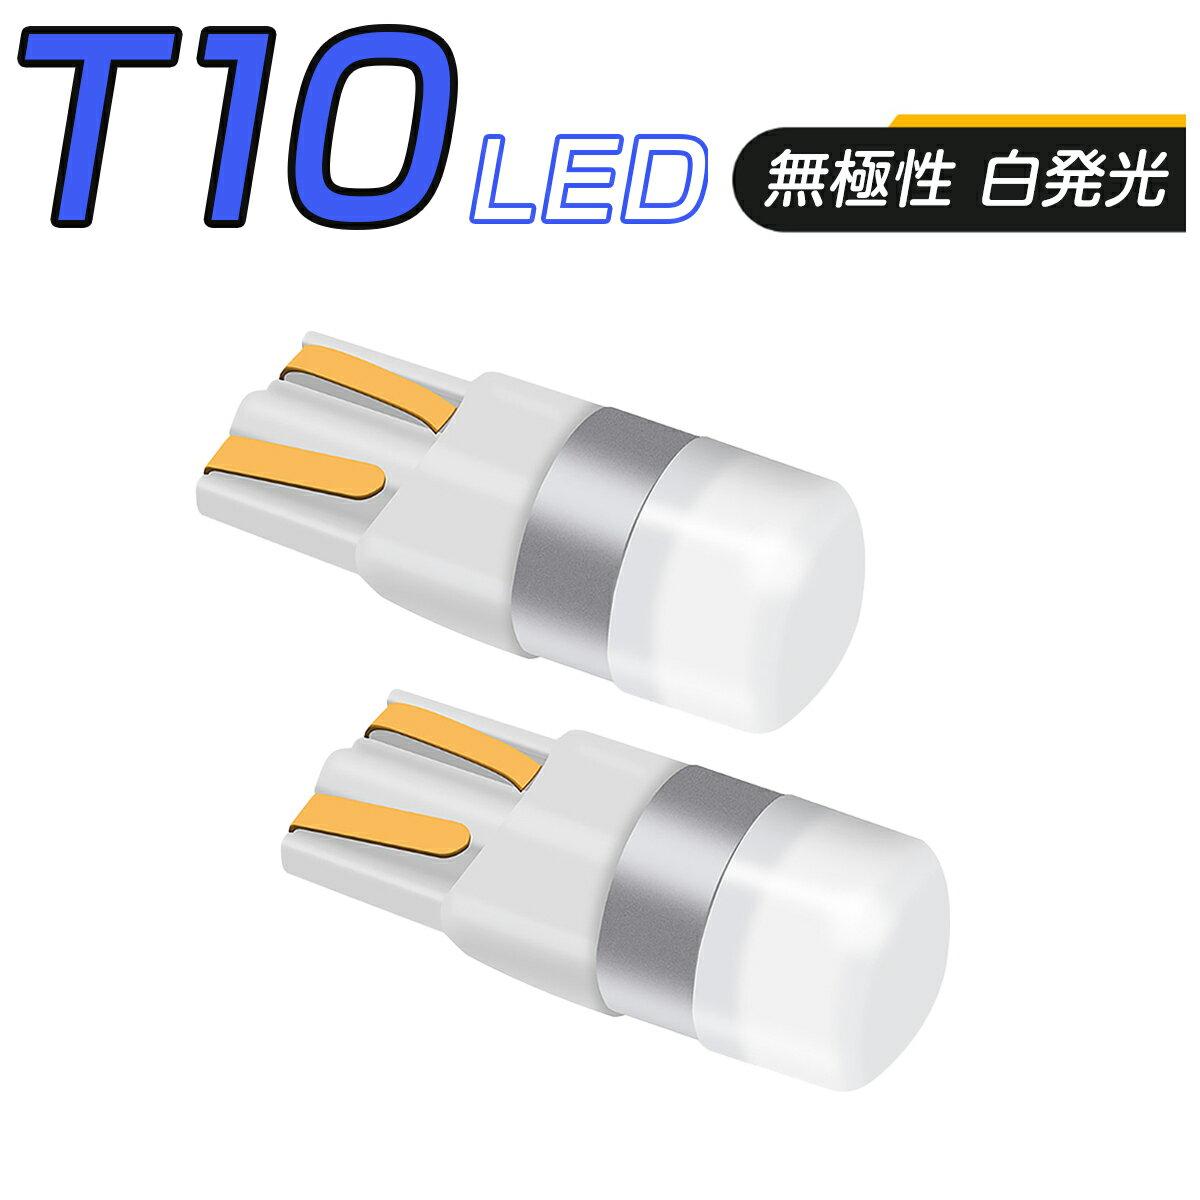 TOYOTA クラウン ロイヤル H25.1〜H27.5 AWS210・GRS21# ナンバー灯[T10]白色 LED 白 T10 T13 T15 T16 キャンセラー付き 12V/24V 無極性 2個セット メール便送料無料 3ヶ月保証 K&M